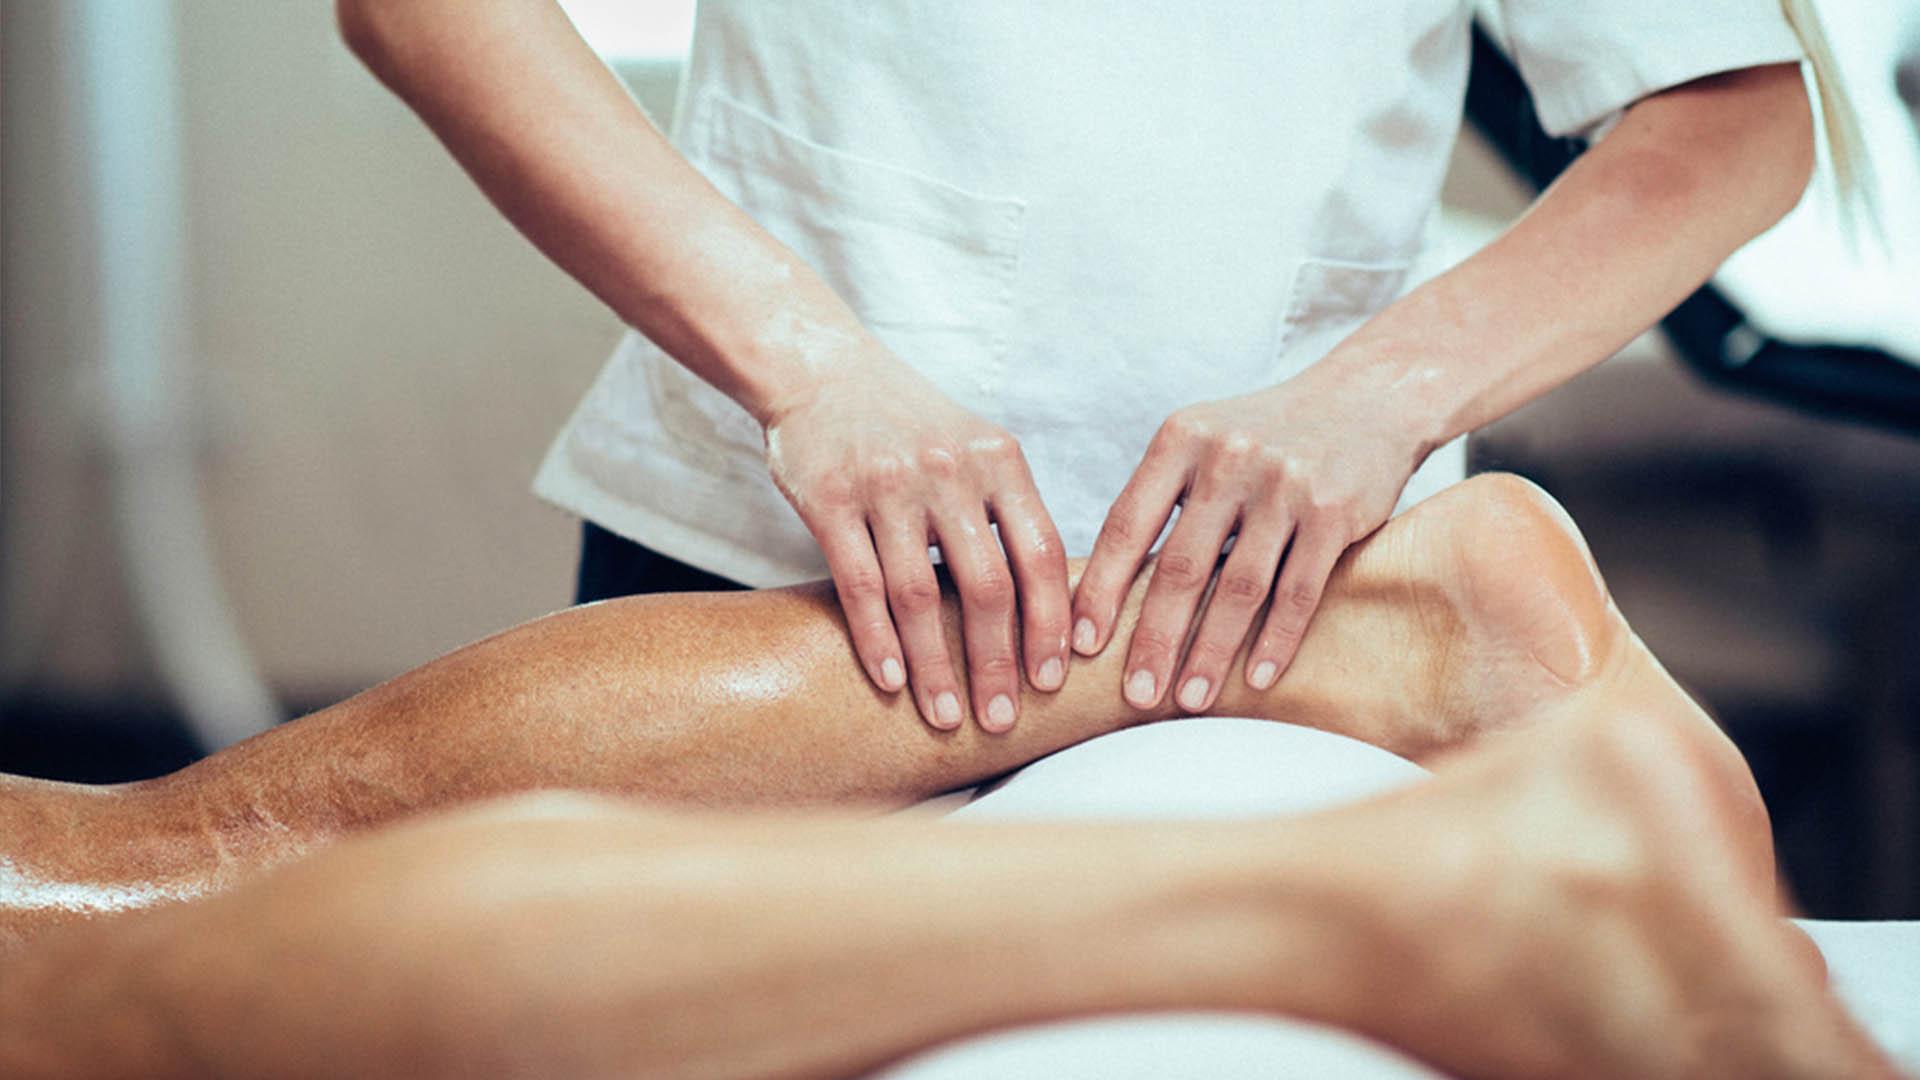 fisio-masaje-alcorcon-fisioterapia-deportiva-zona-sur-madrid-tarifas-amaype